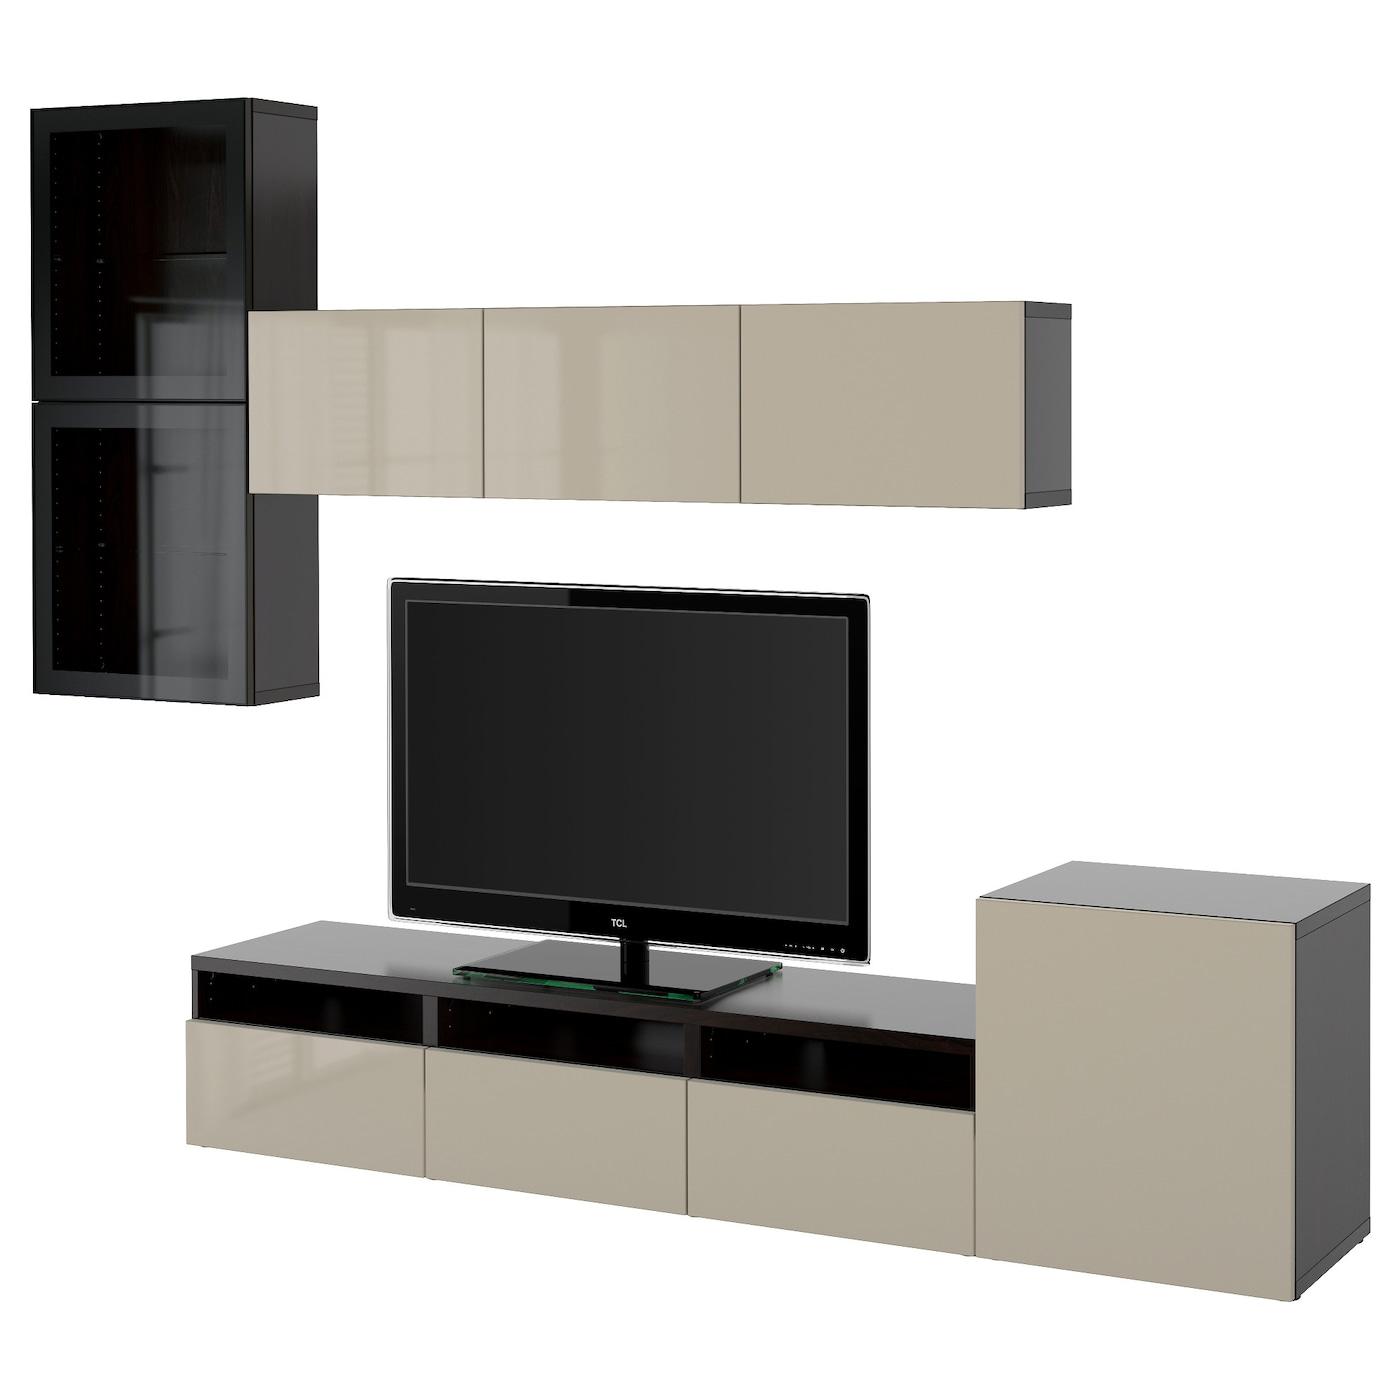 Zwevende Plank Onder Tv.Tv Meubel Ikea